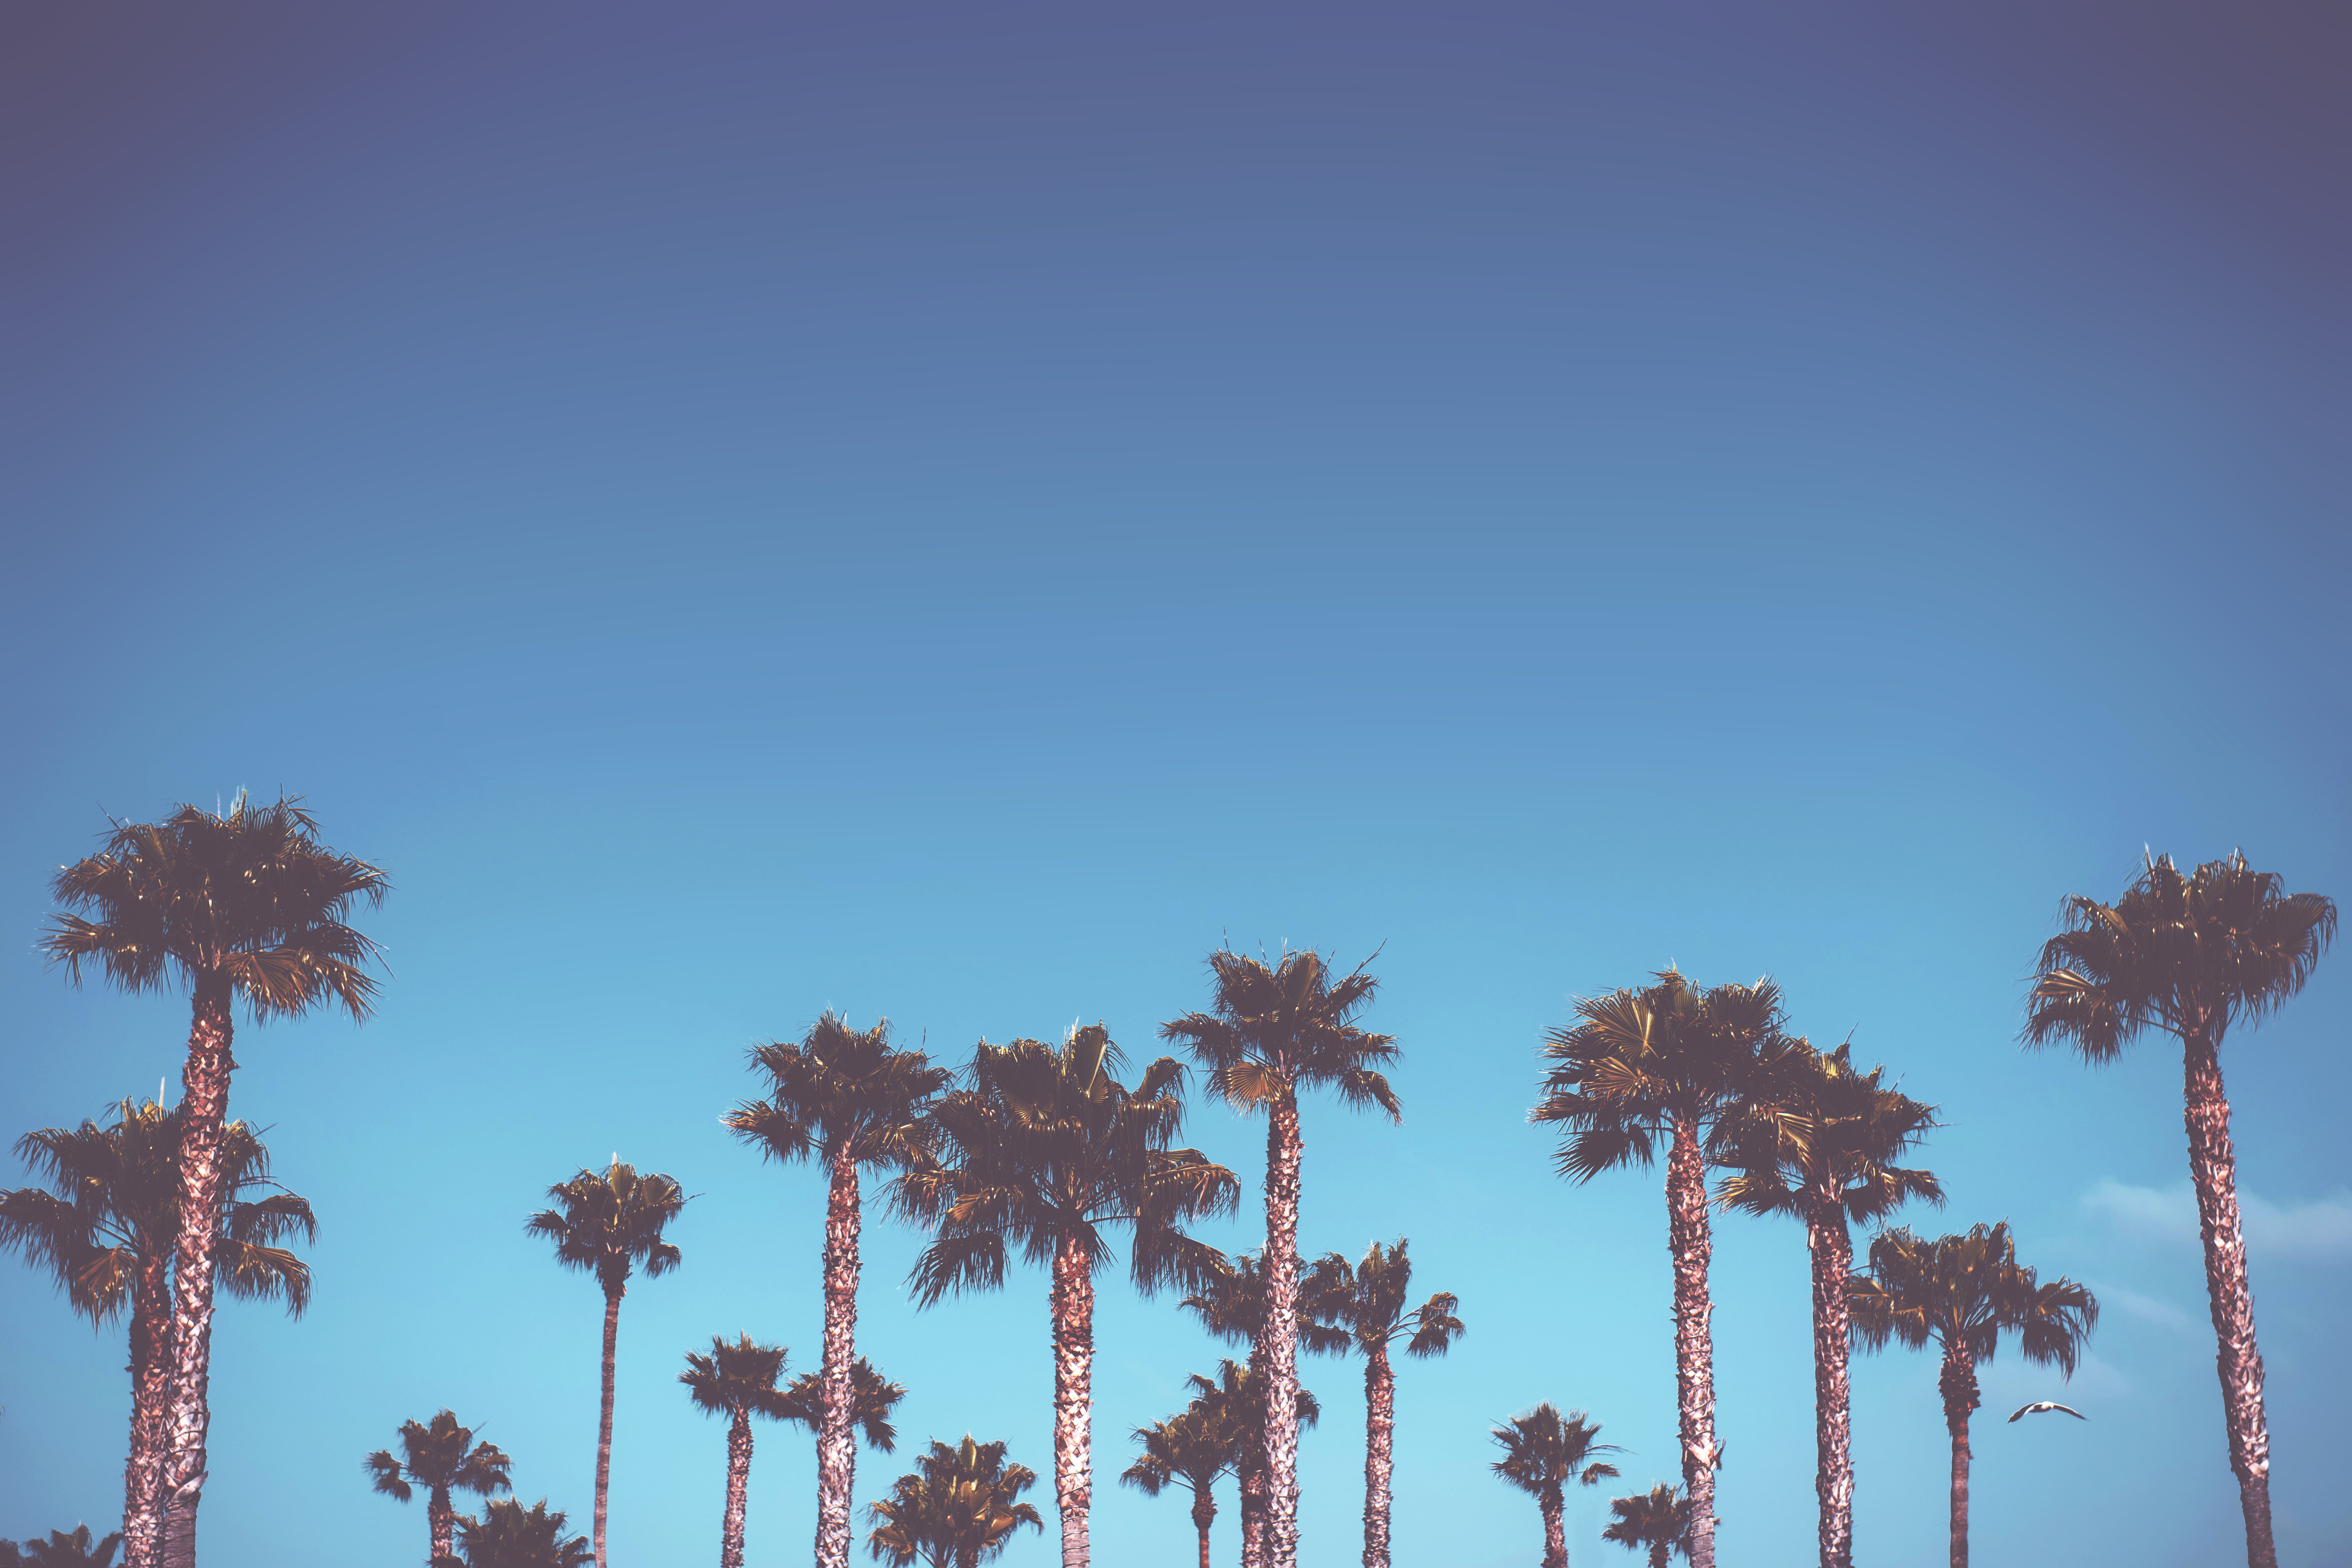 Free stock photo of sky, desktop, background, palm trees